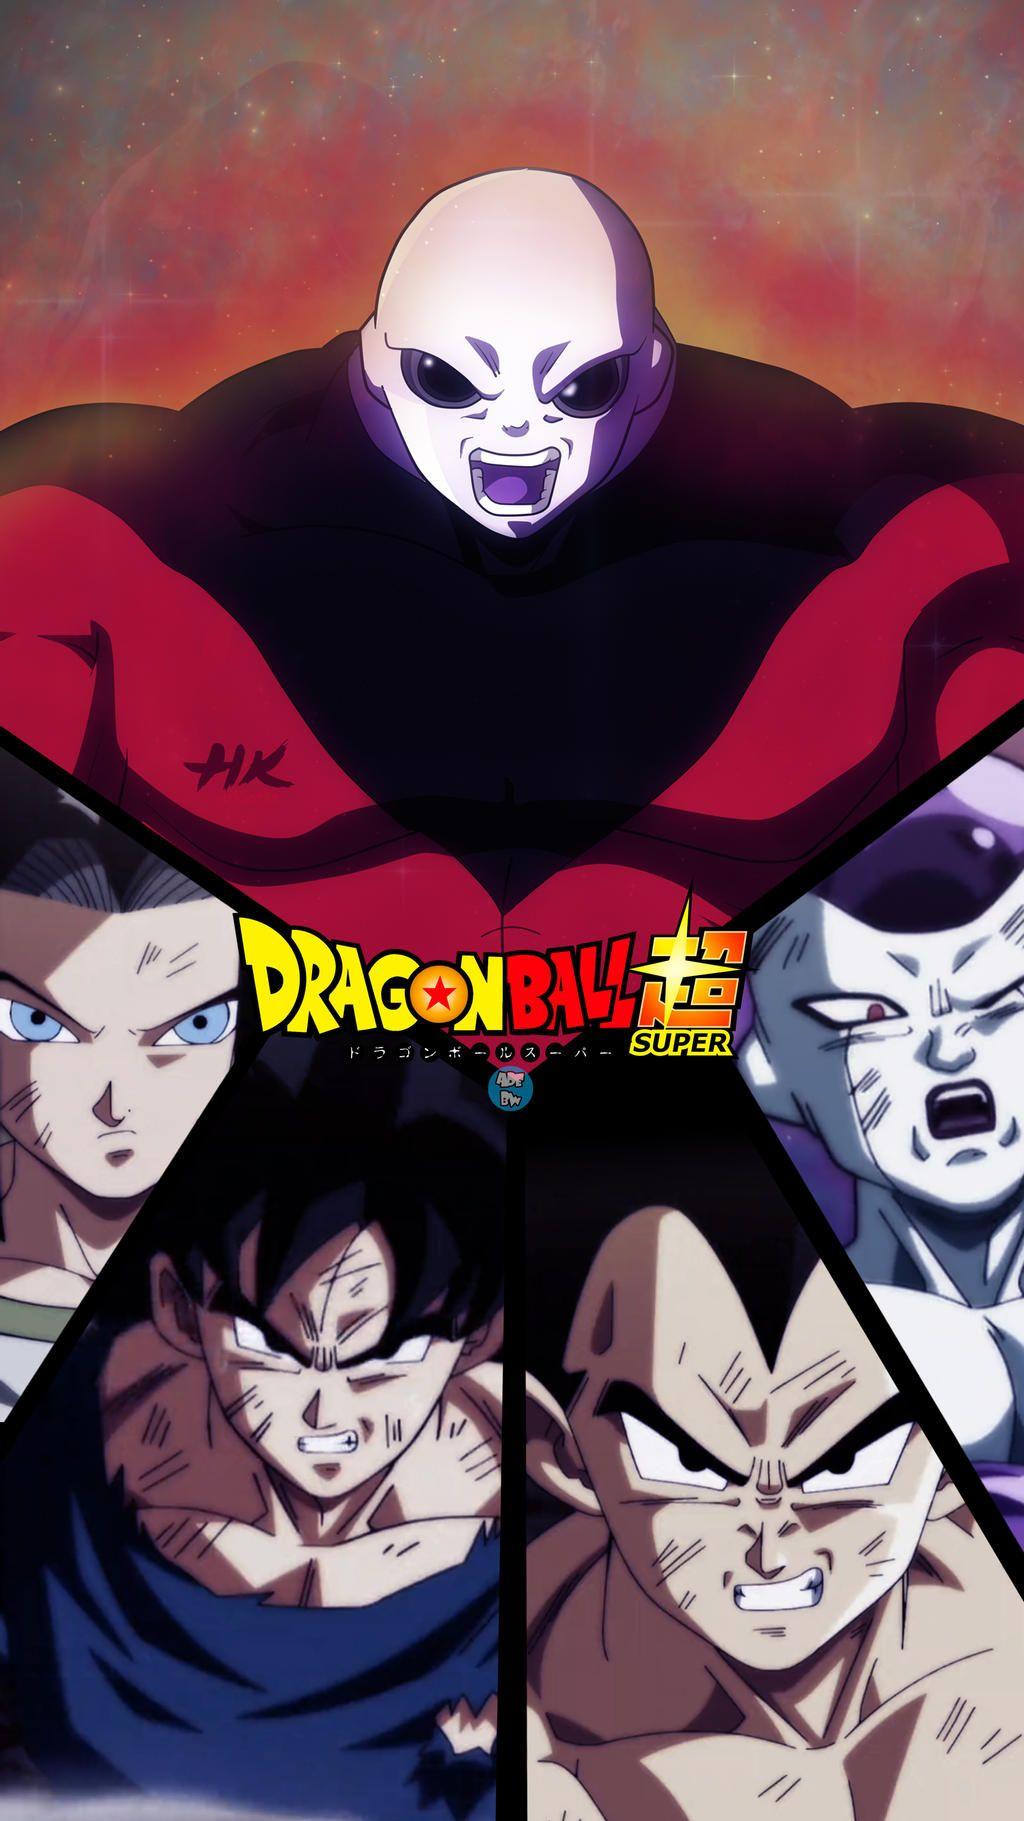 Pin By Dragonball On Jiren In 2021 Dragon Ball Super Dragon Z Dragon Ball